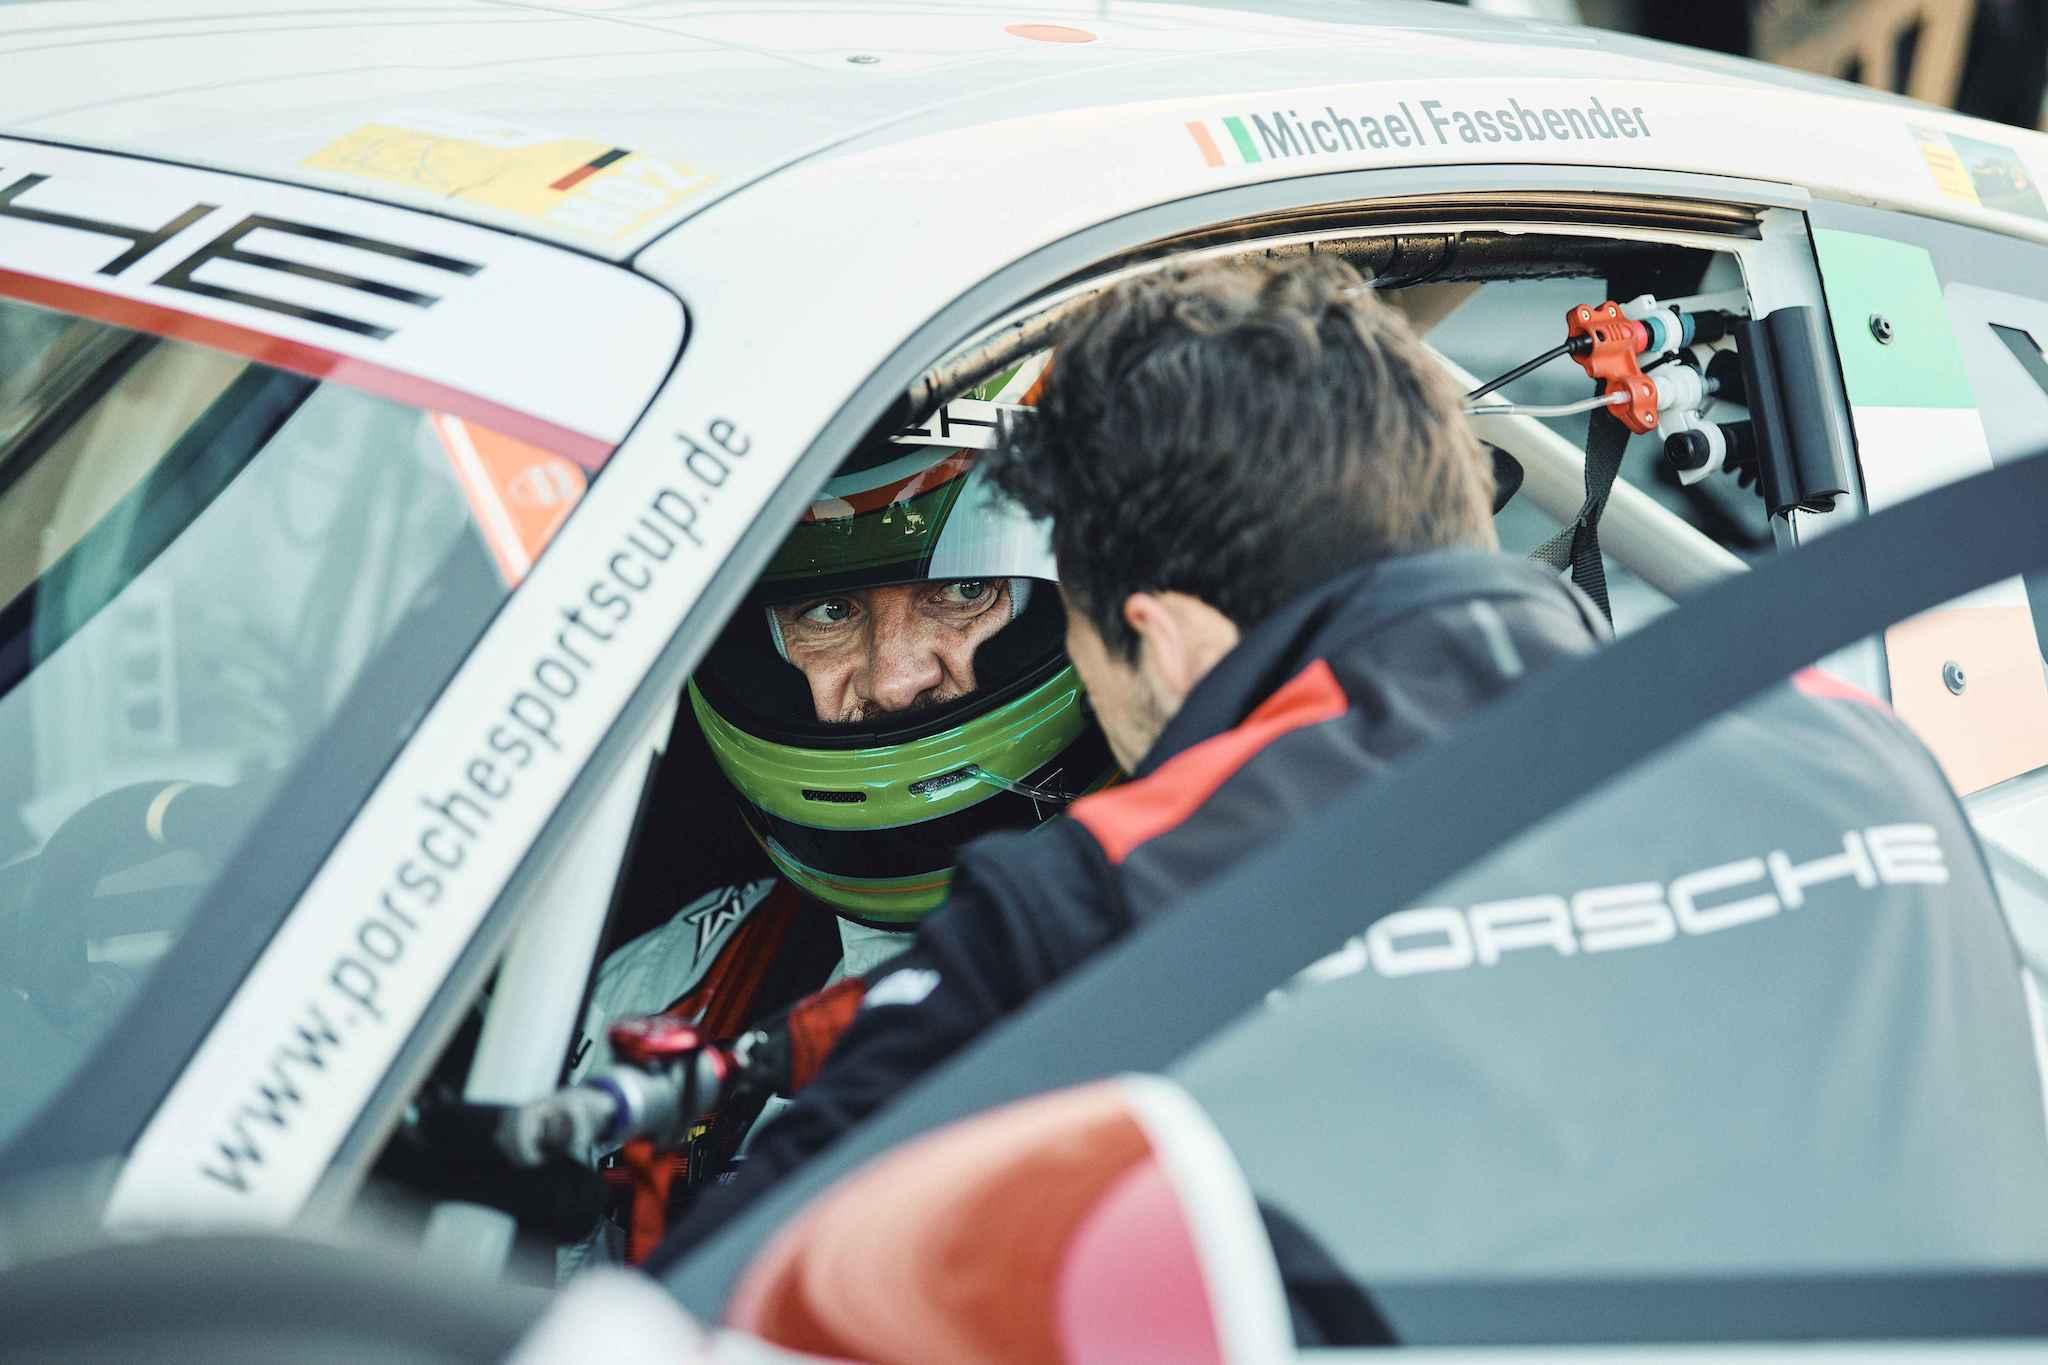 Porsche 針對賽事愛好者的入門課程包含了駕駛485 hp 的Porsche 911 GT3 Cup 接受訓練。